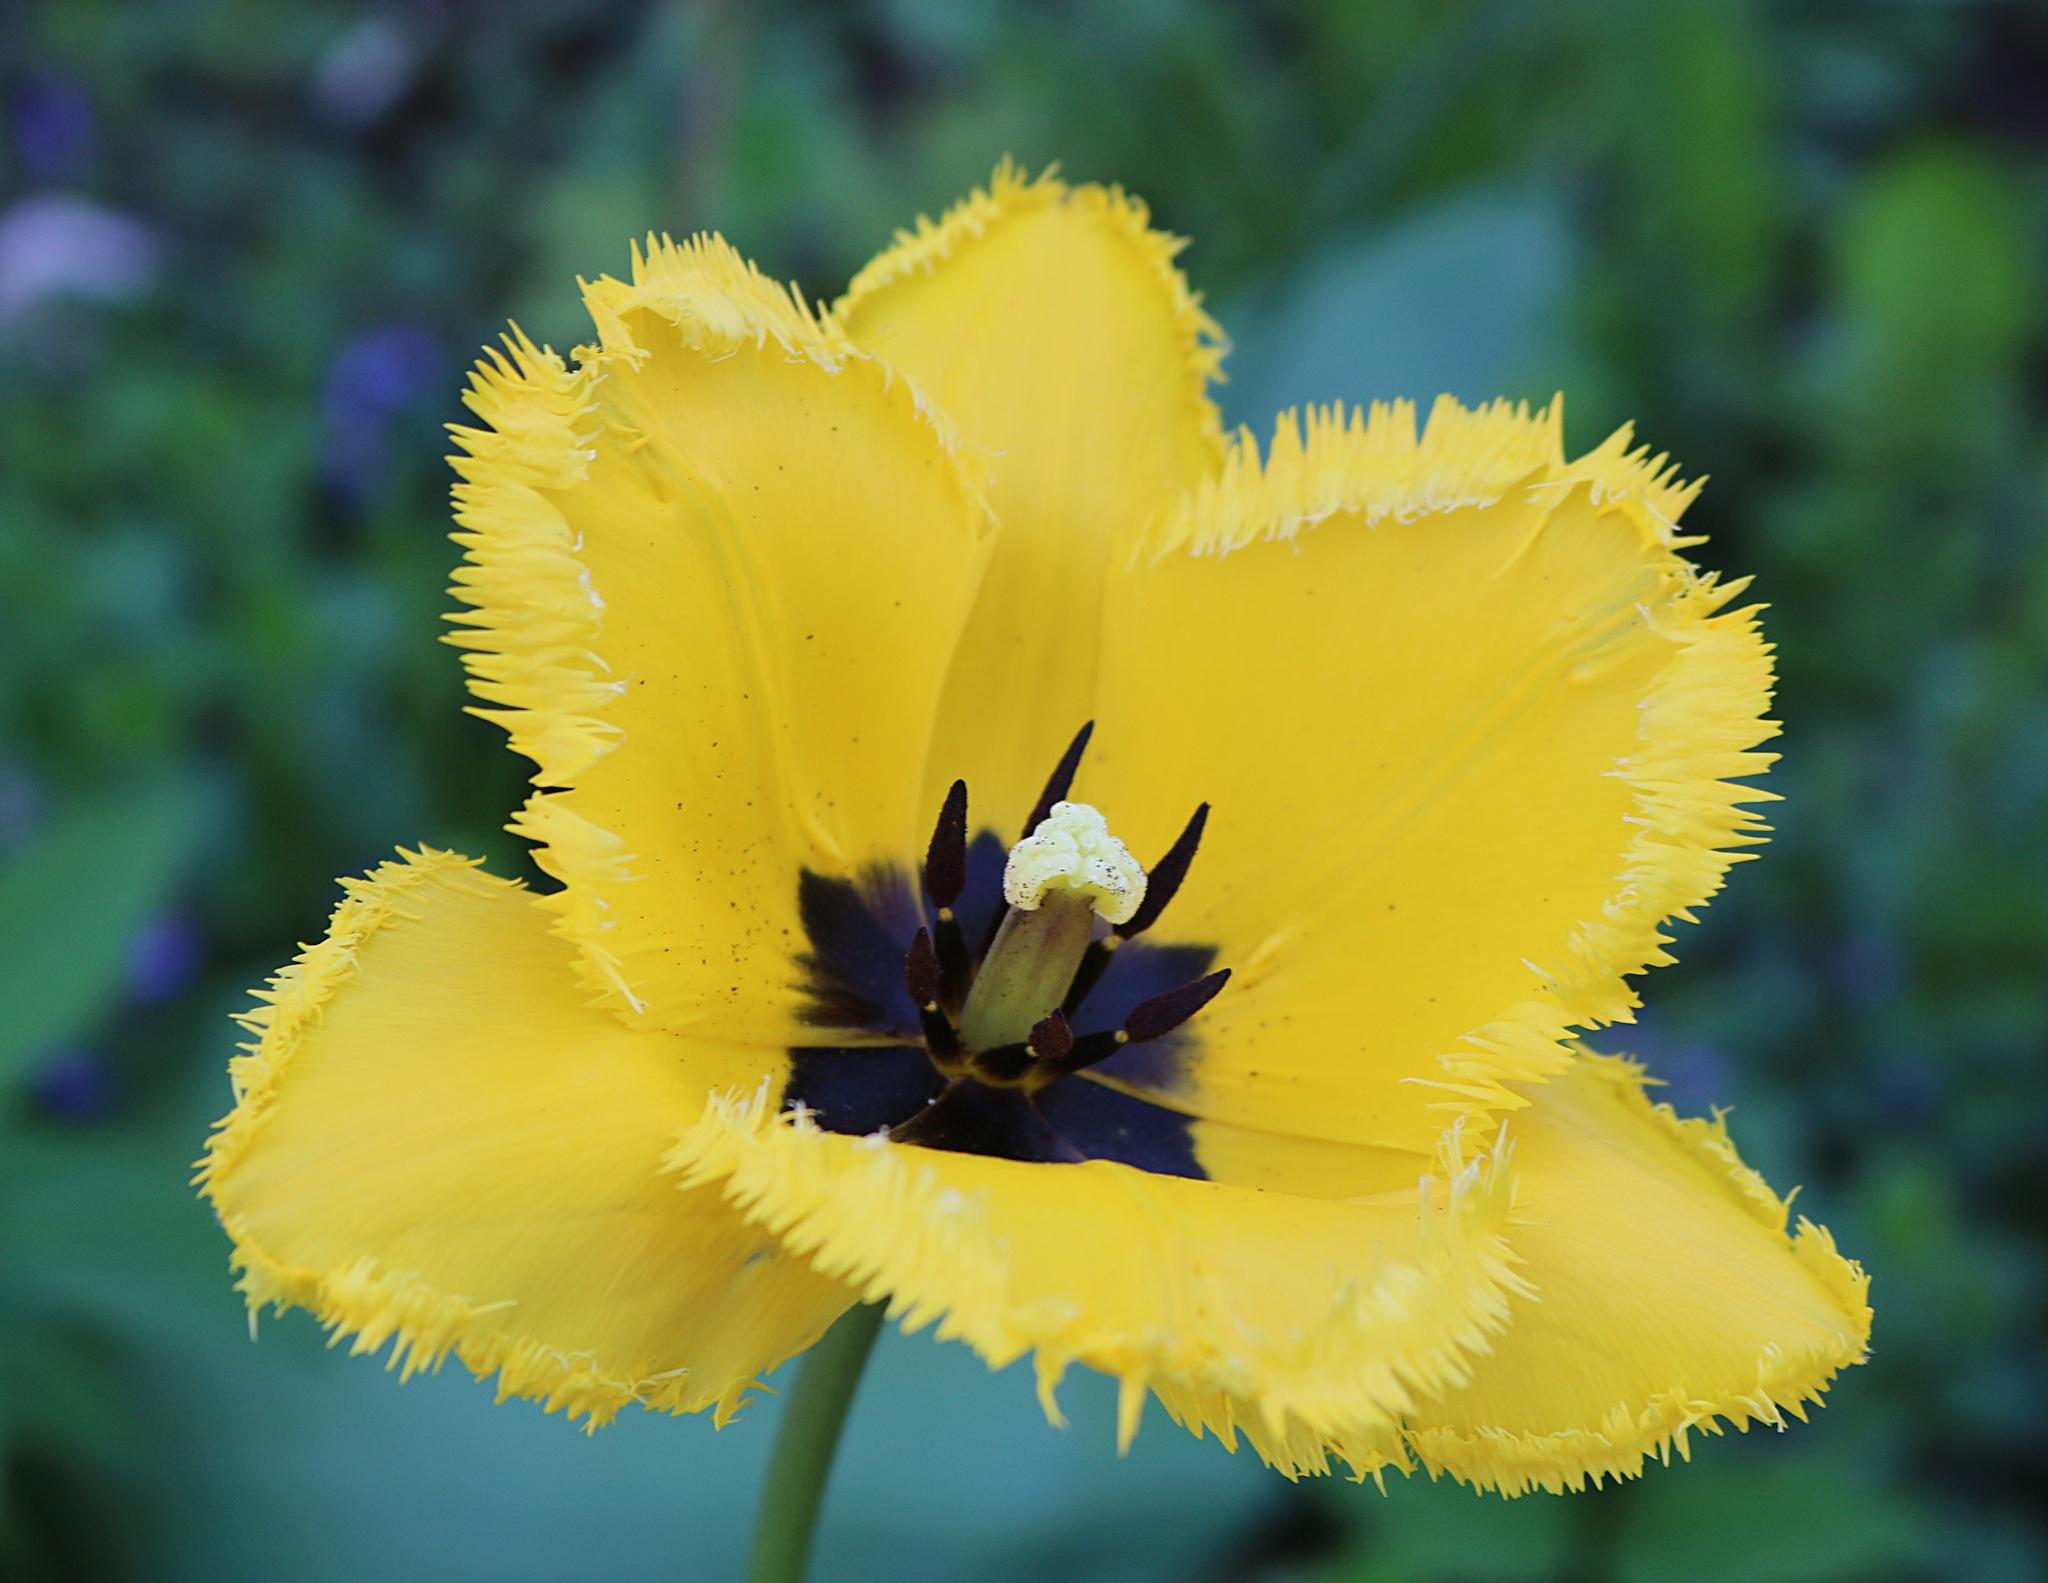 Tulipan by zvnktomasevic